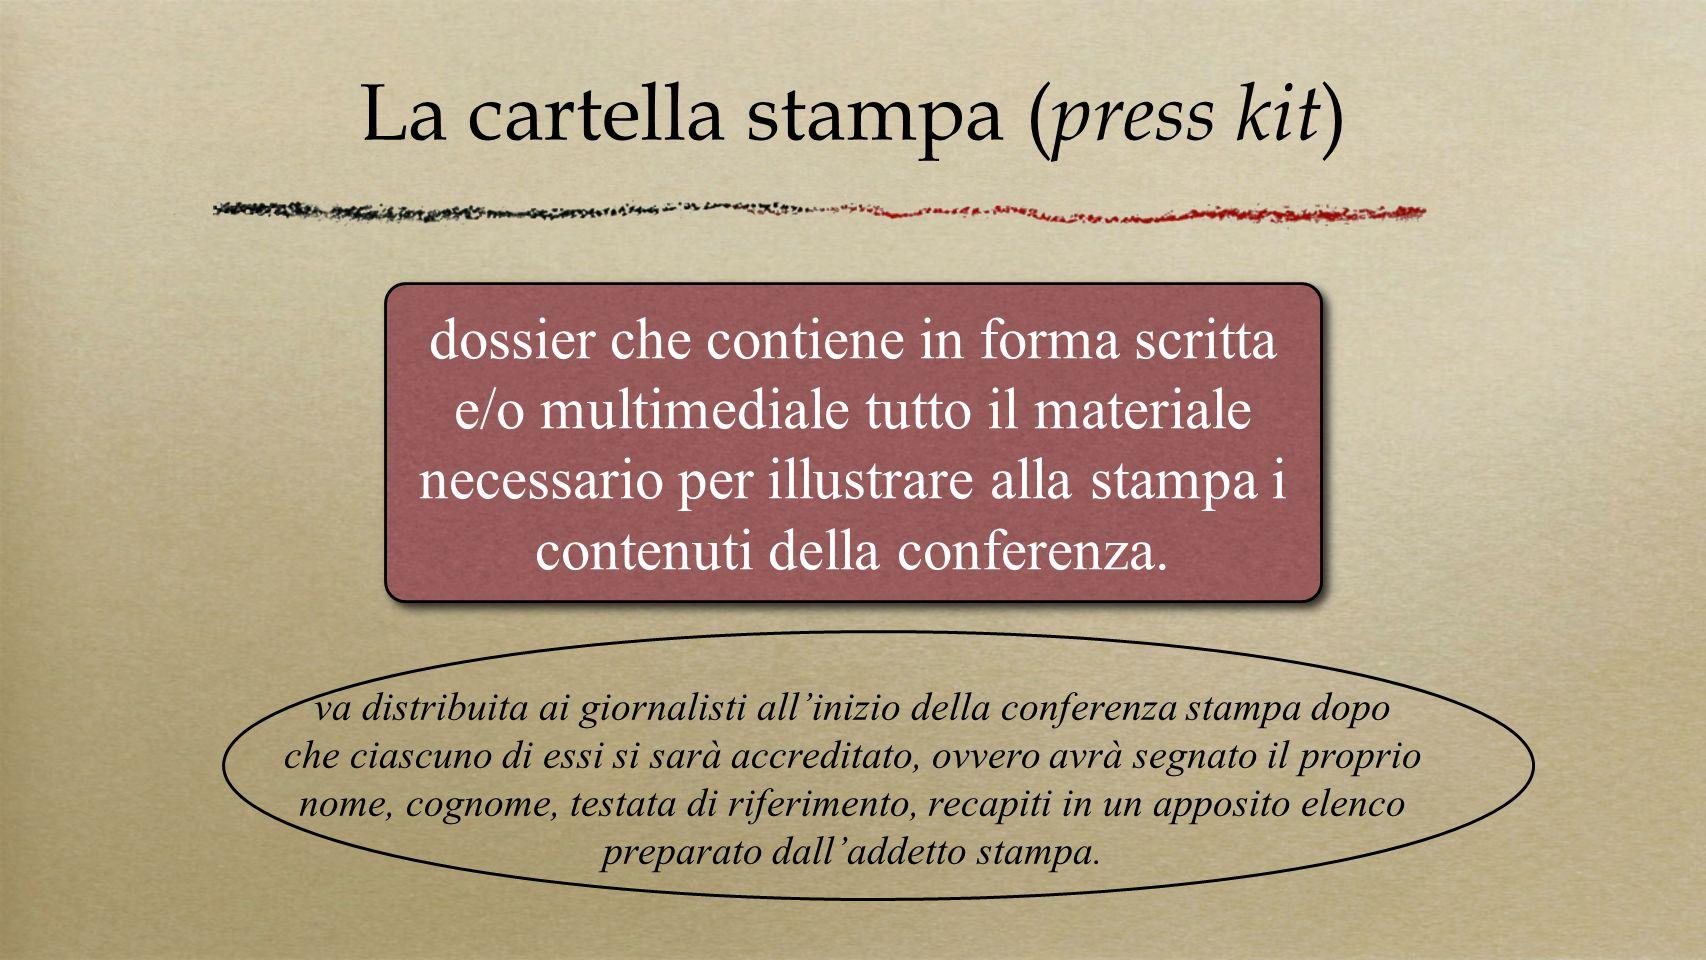 La cartella stampa (press kit)